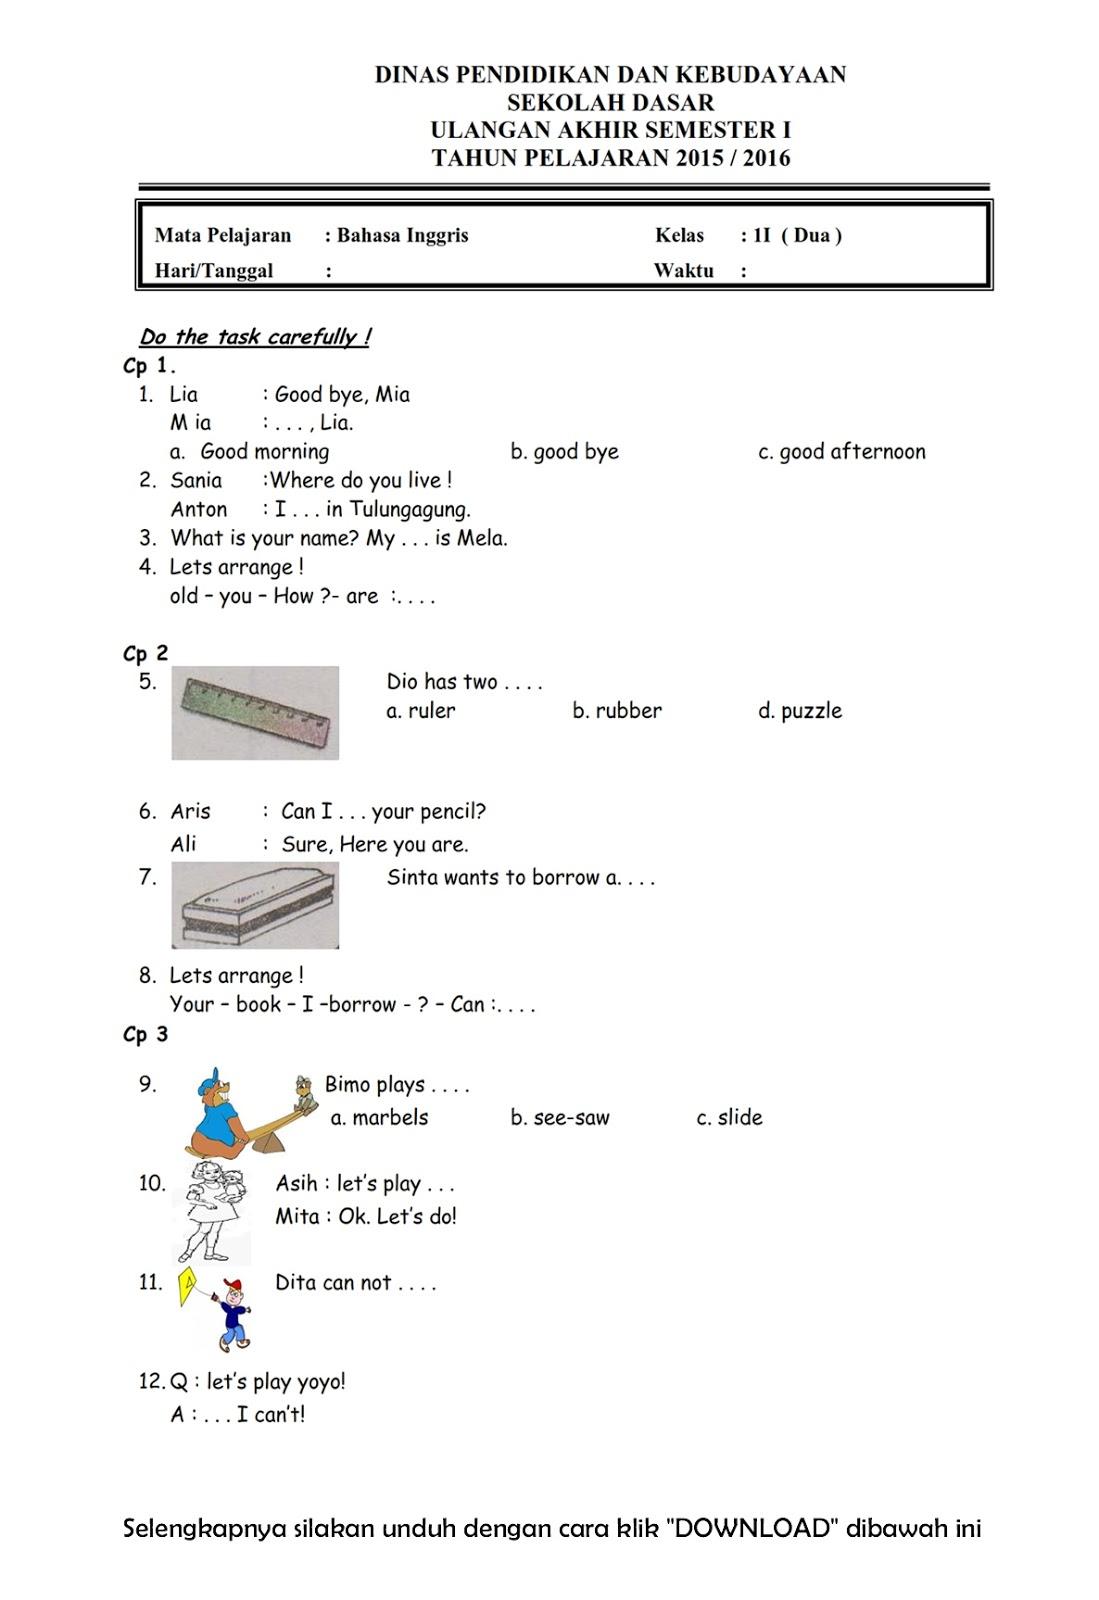 Contoh Soal Essay Bahasa Inggris Kelas Xii Best Essays